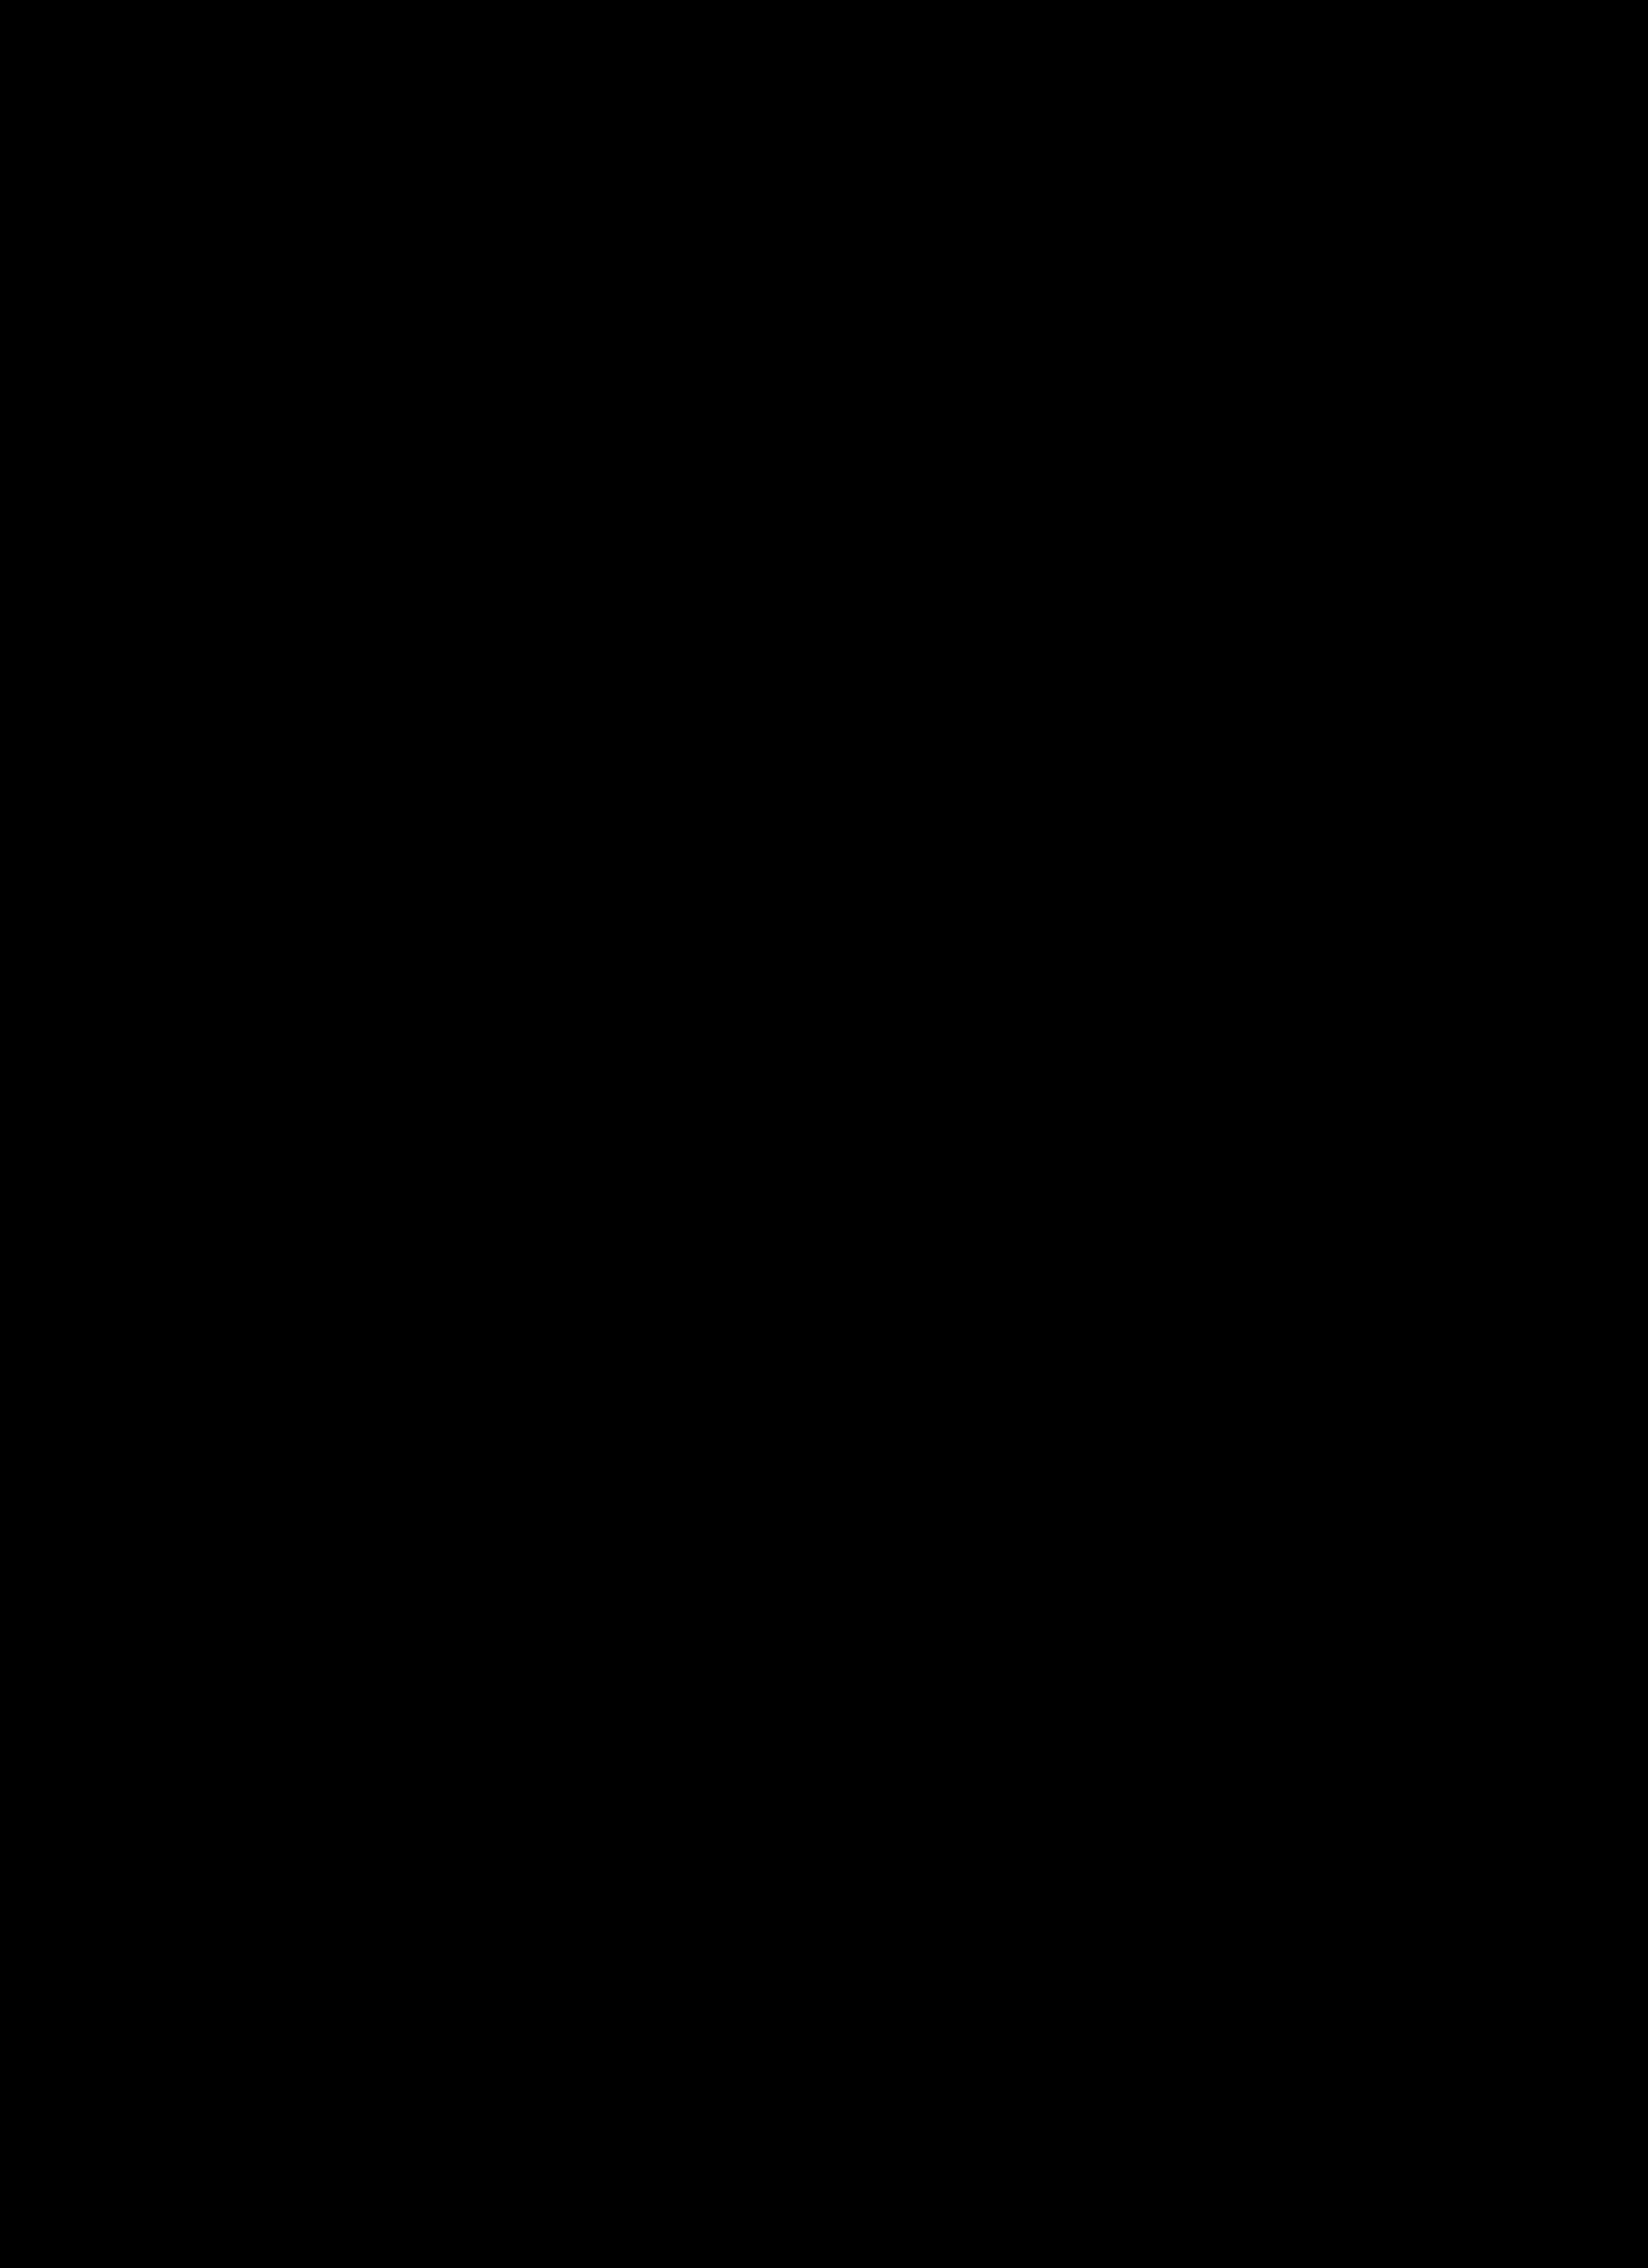 Clipart empty cornucopia